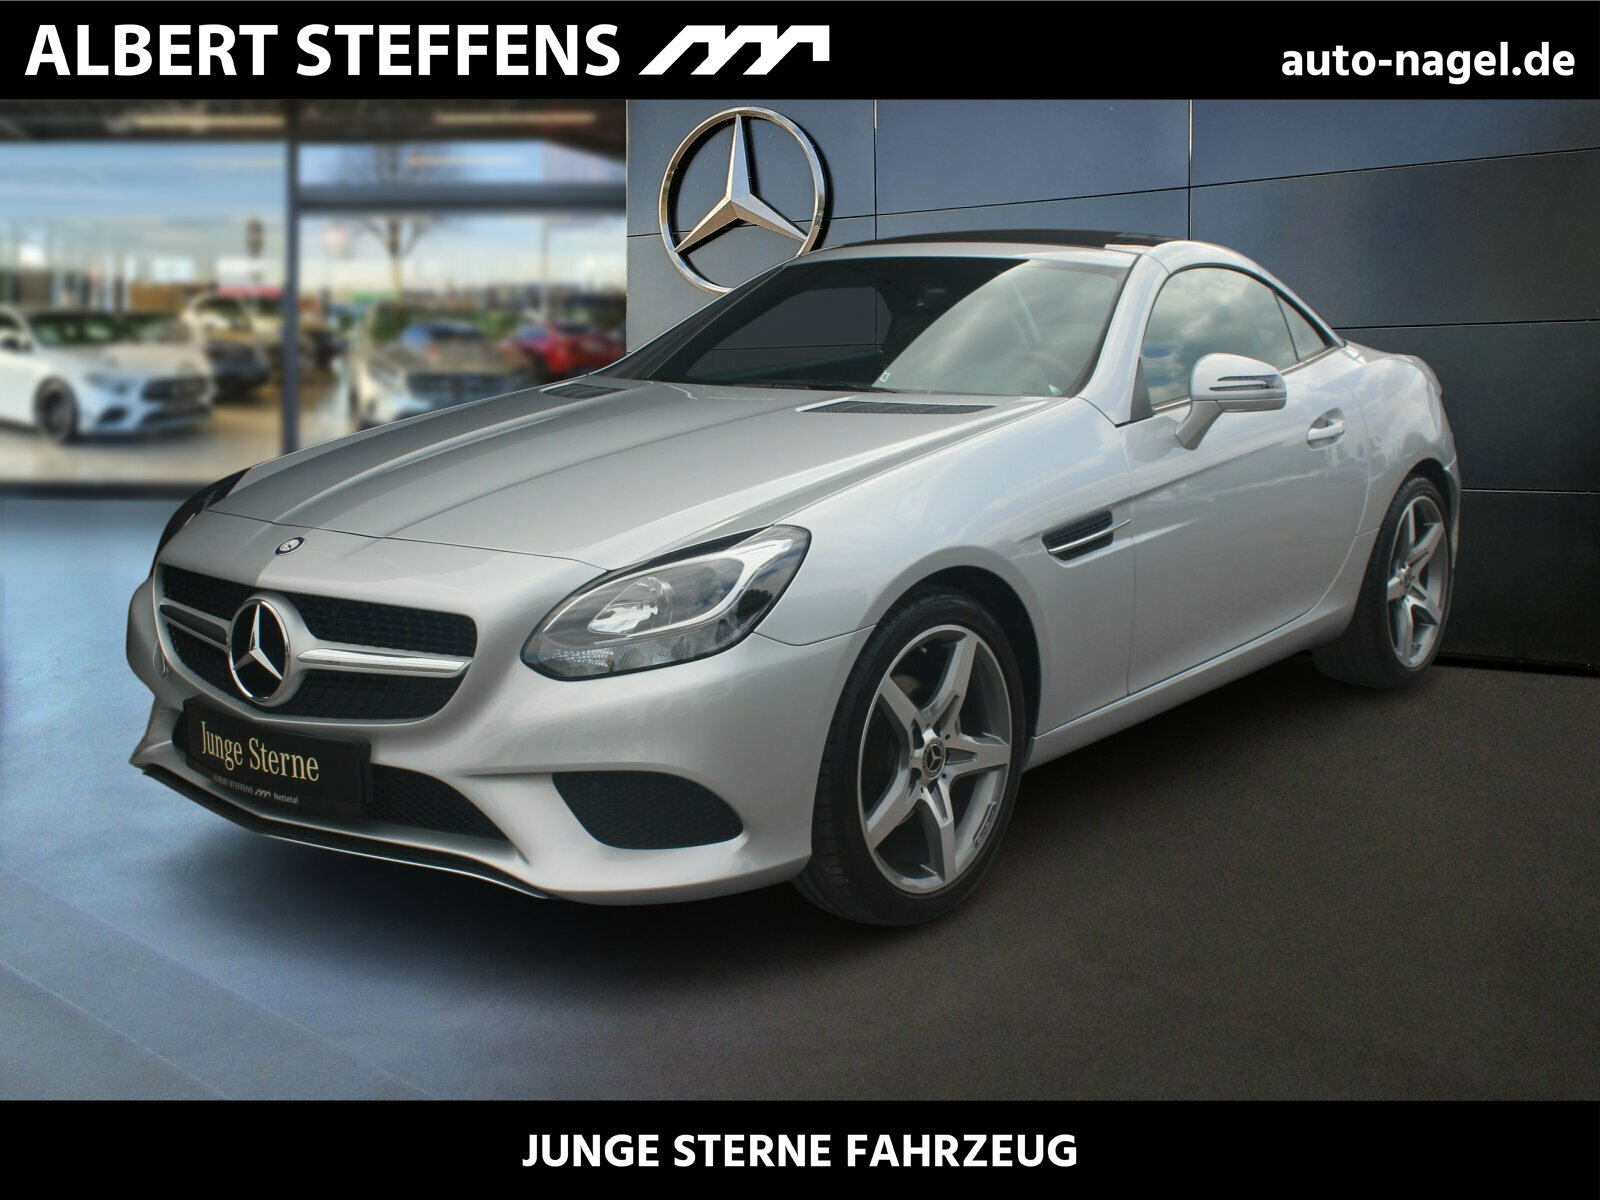 "Mercedes-Benz SLC 180 AMBIENTE+18"" AMG+NAPPA LEDER+DESIGNO, Jahr 2017, petrol"